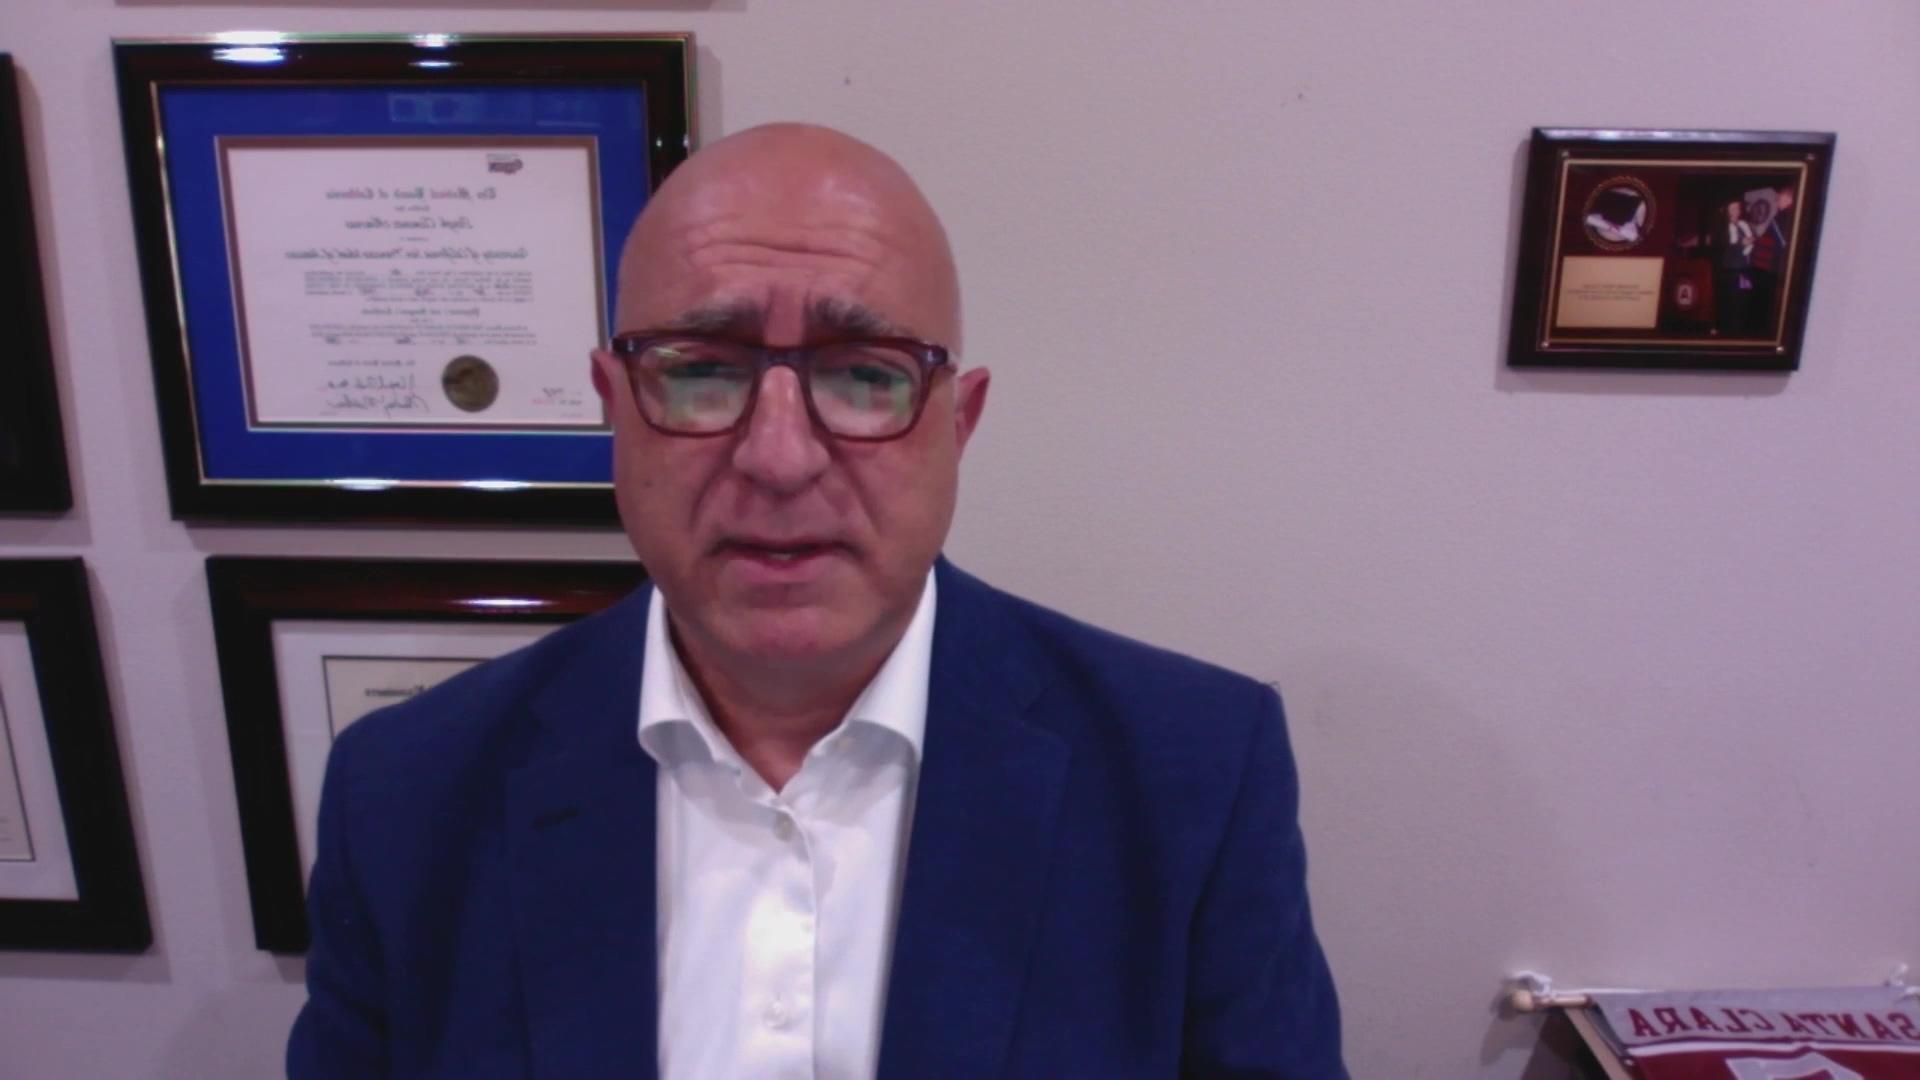 Dr. Alvarnas - Precision Medicine - More effective treatments more quickly and efficiently